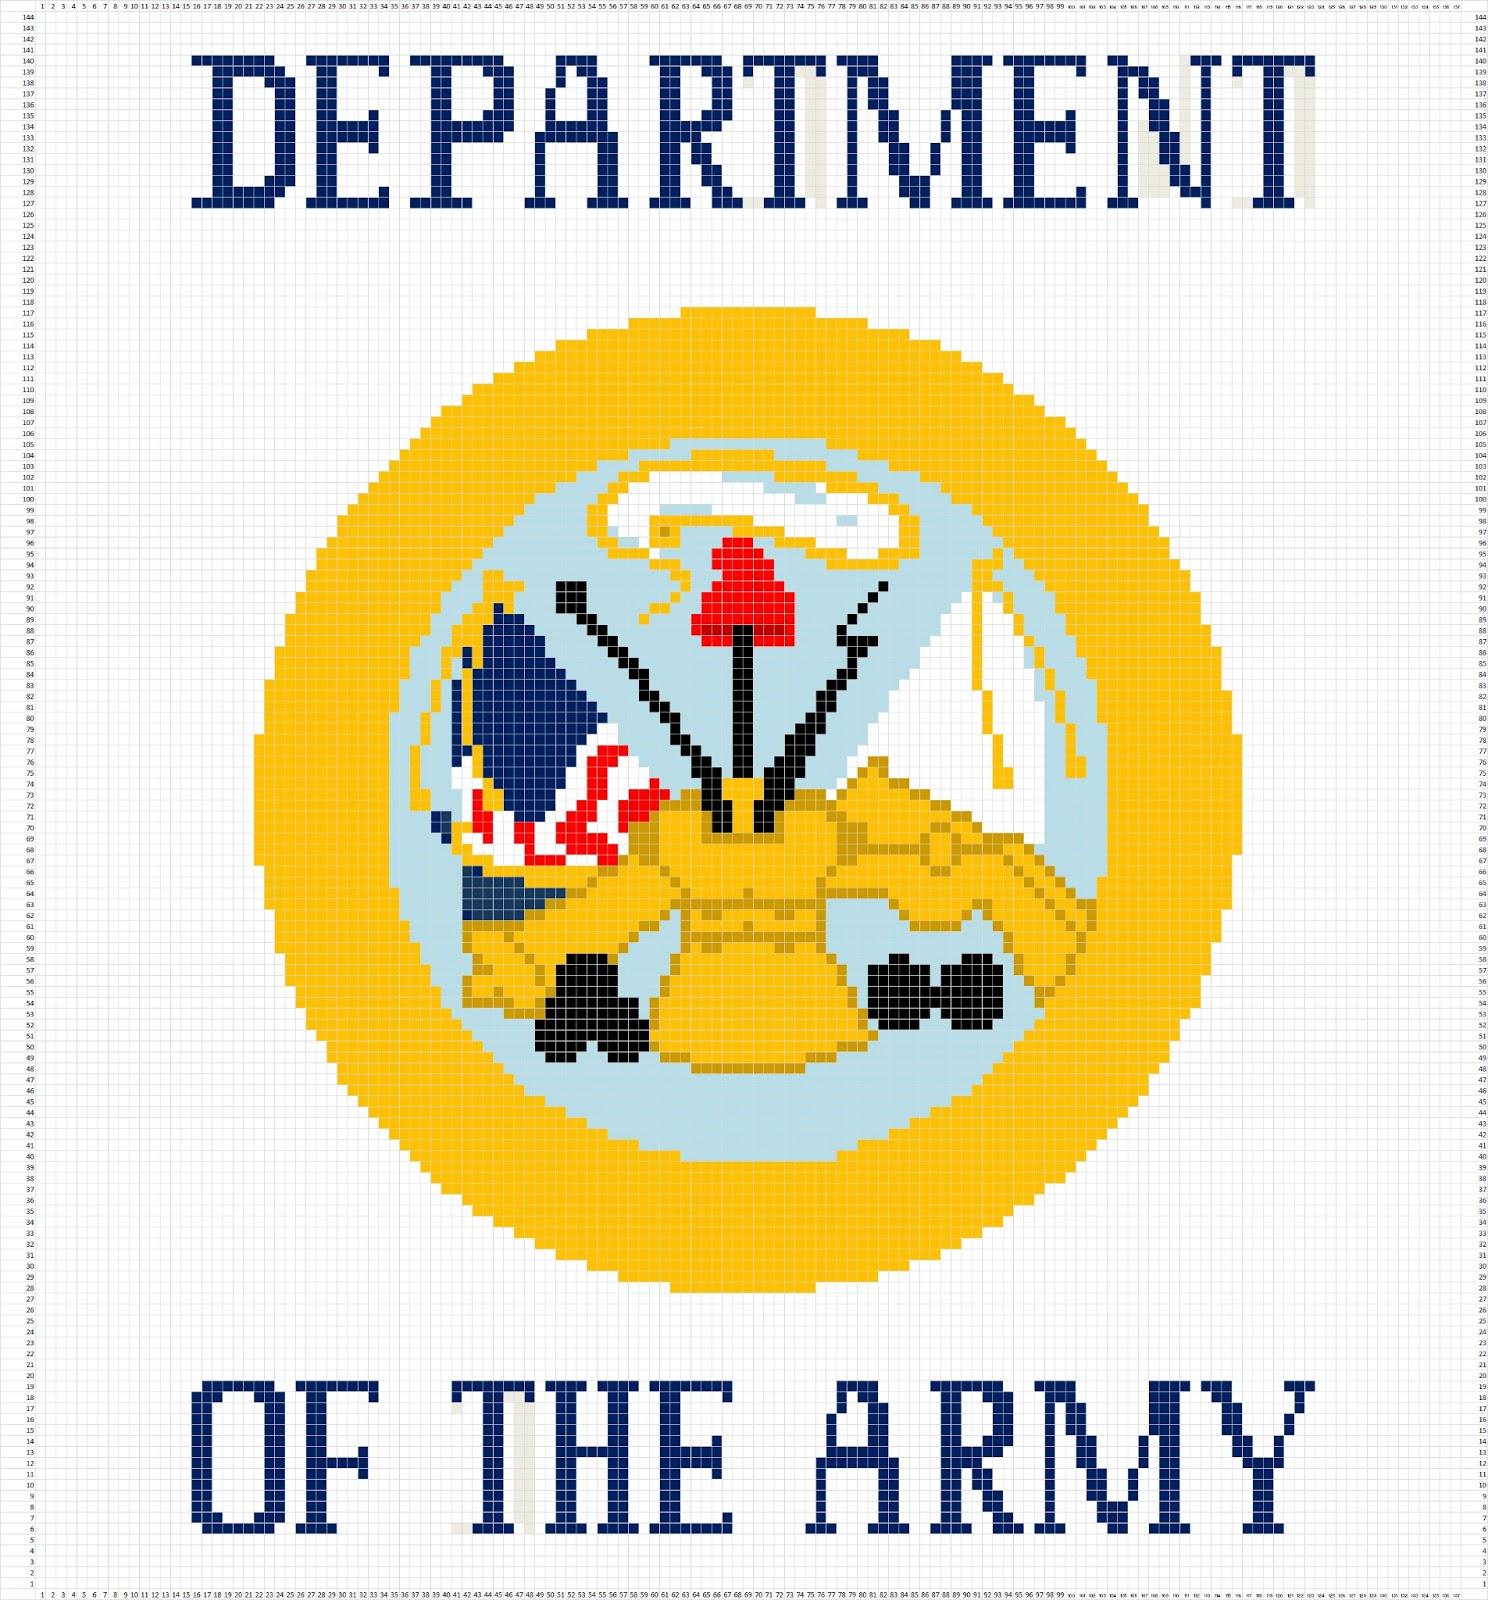 Crochet Parfait Marine Corps Afghan Written Pattern Stitch Diagram Patterns Diagrams Army Chart